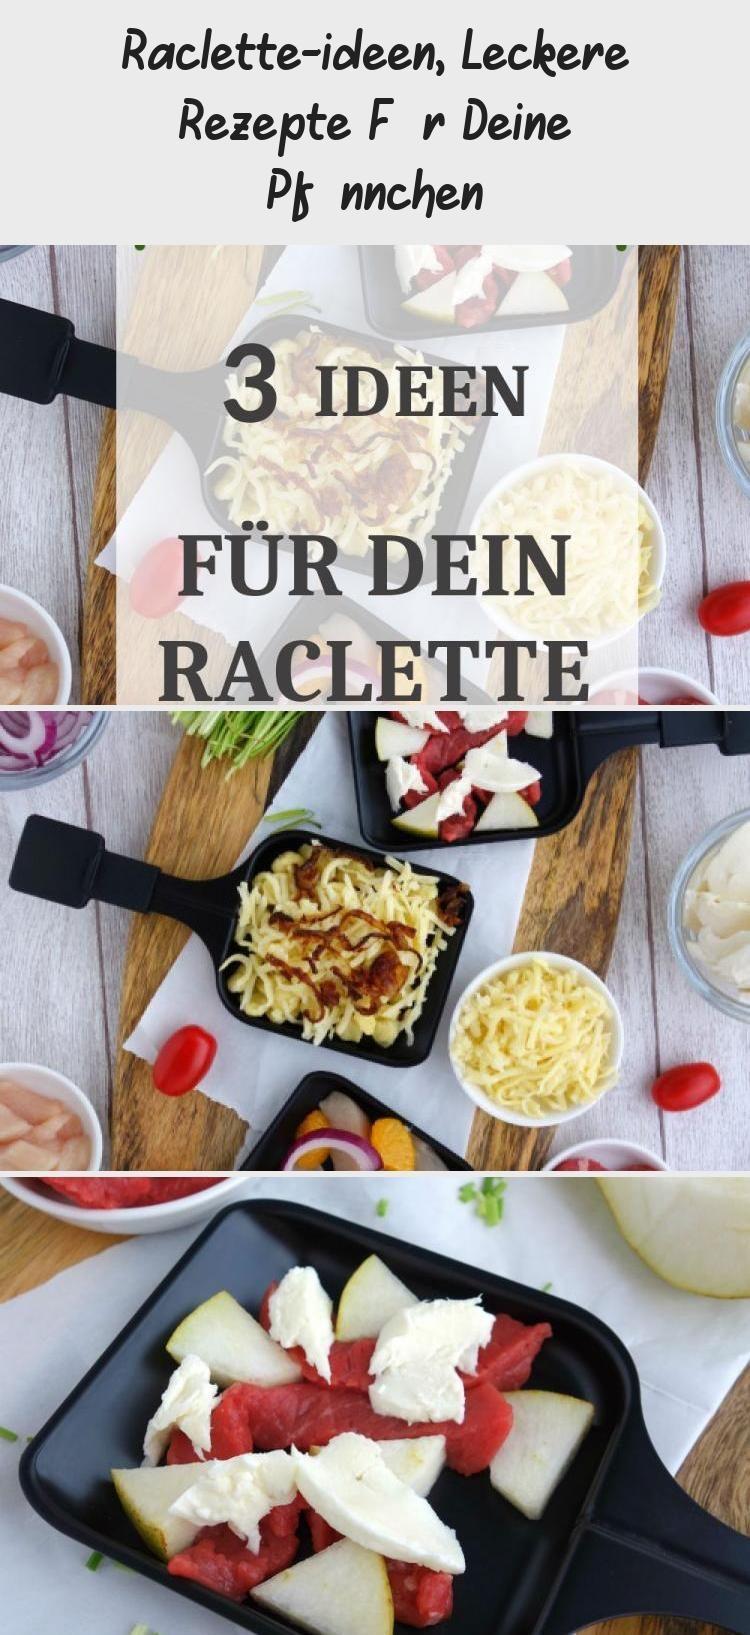 65b3fafcecf1951ccf4477300ff52a21 - Raclette Rezepte Silvester